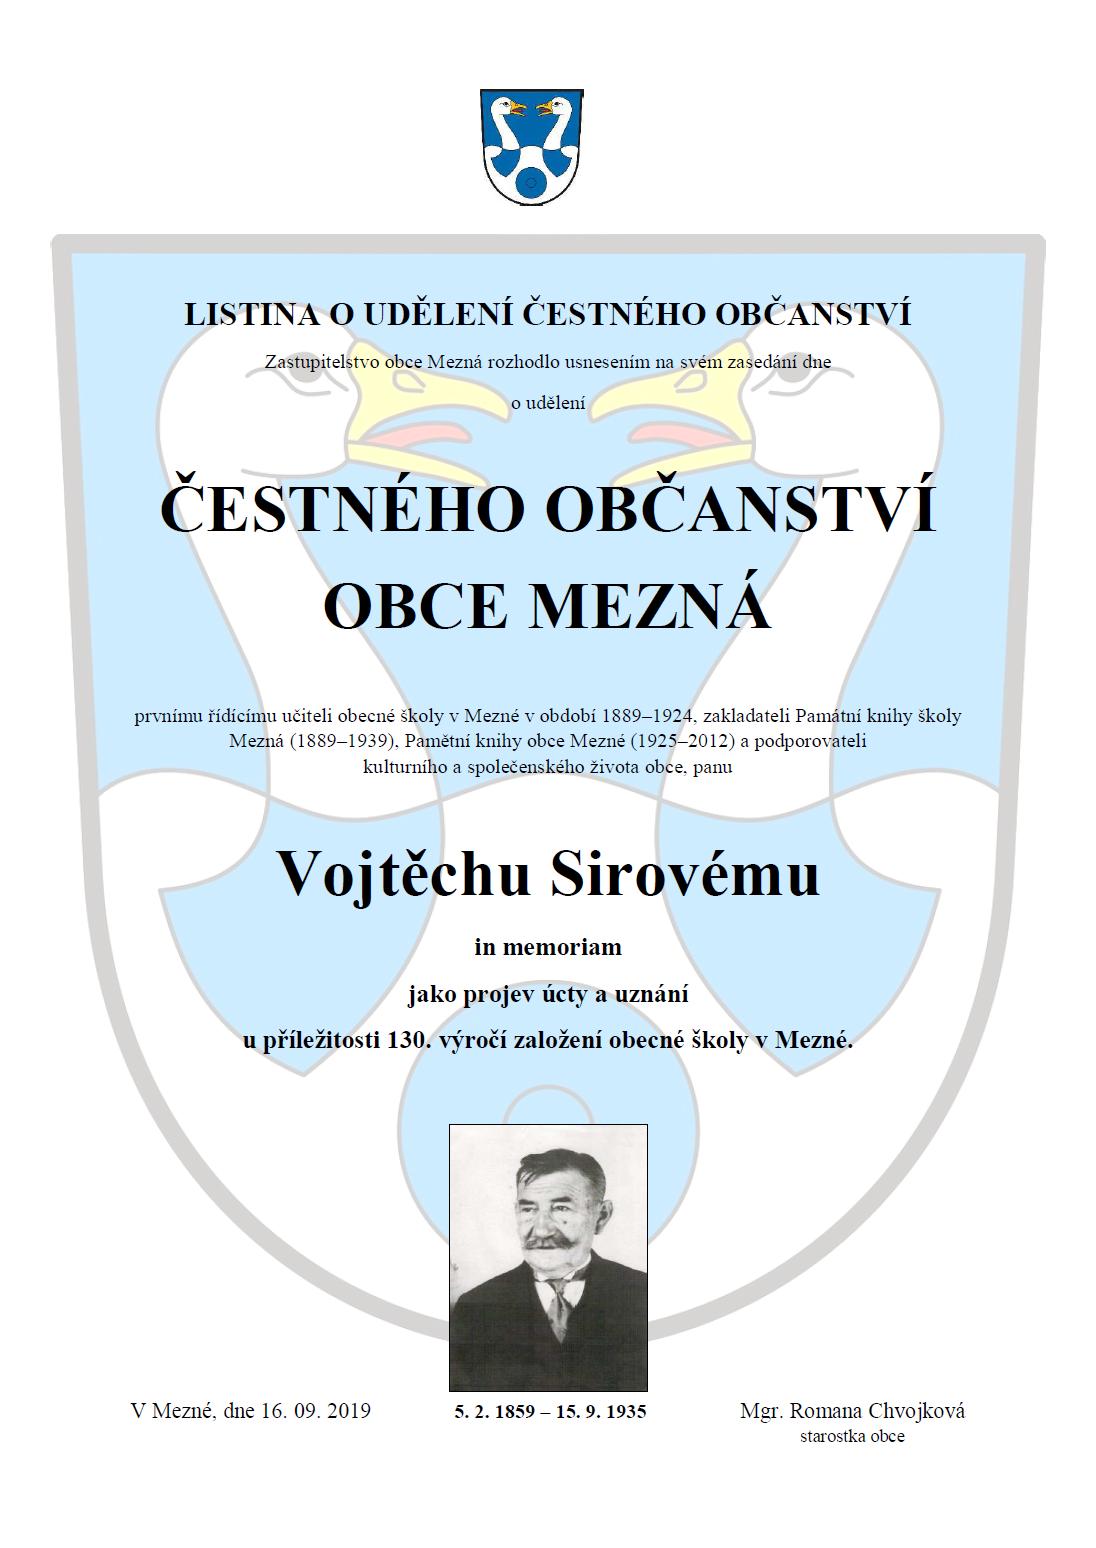 Čestné občanství Vojtěch Sirový, in memoriam